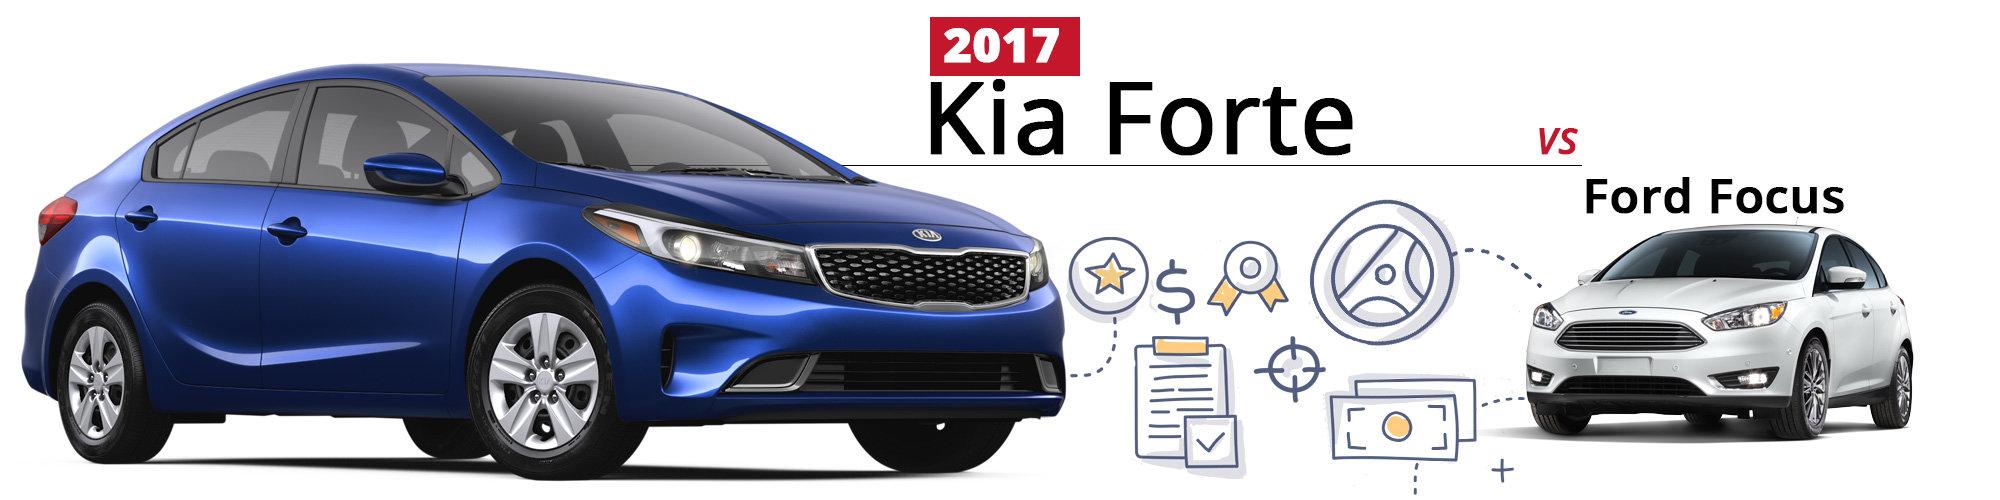 Kia Forte vs. Ford Focus